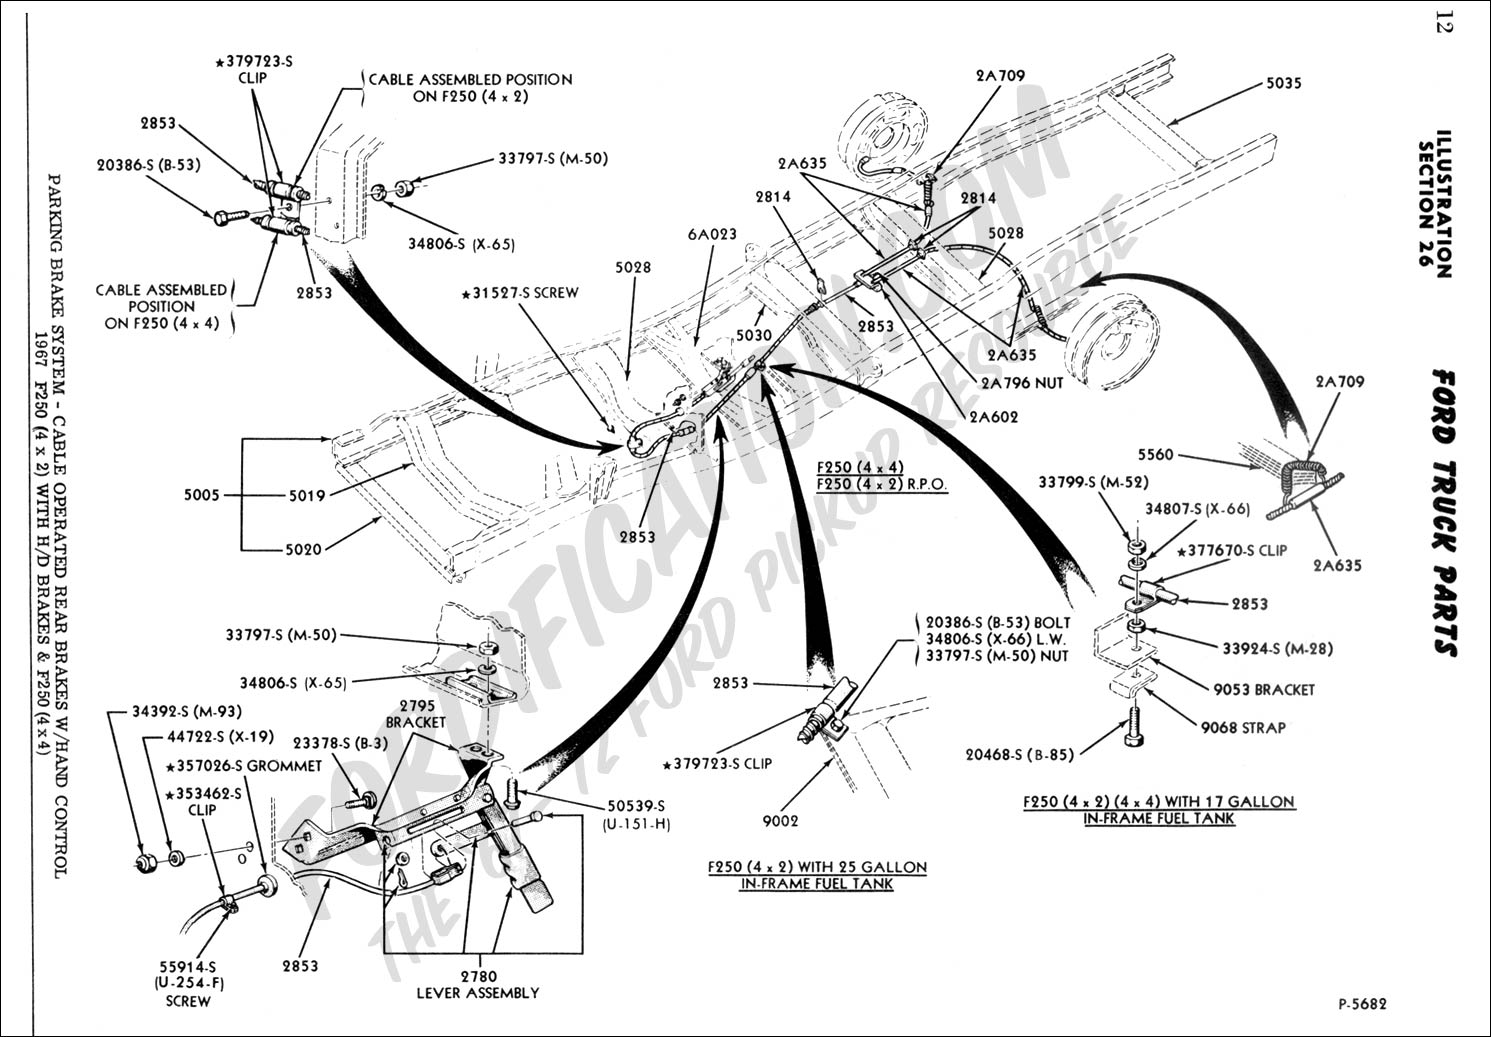 hight resolution of 02 explorer emergency brake diagram wiring diagram and f250 rear brake diagram 99 f250 rear brake caliper